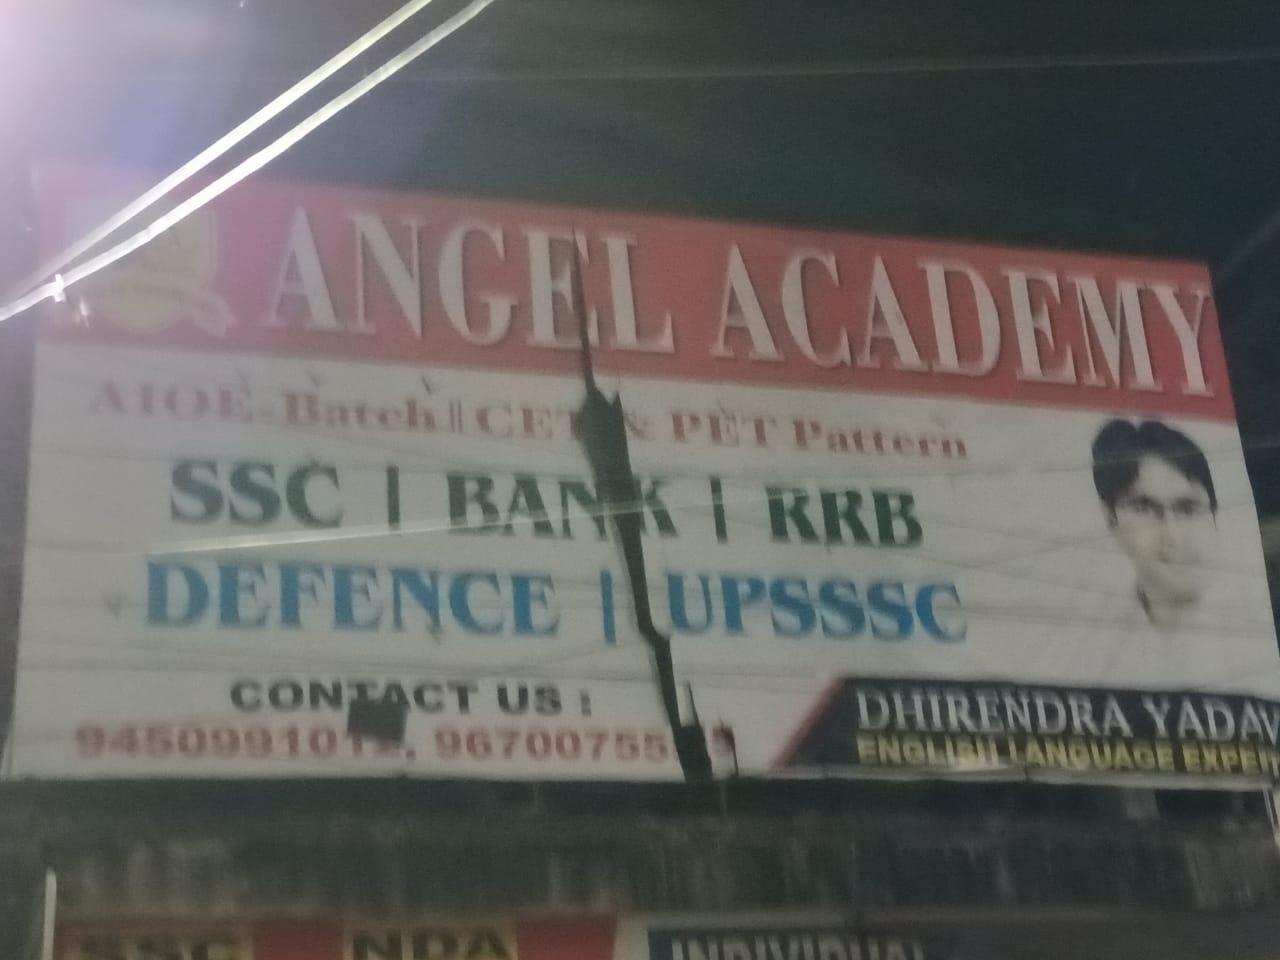 Angel Academy Logo